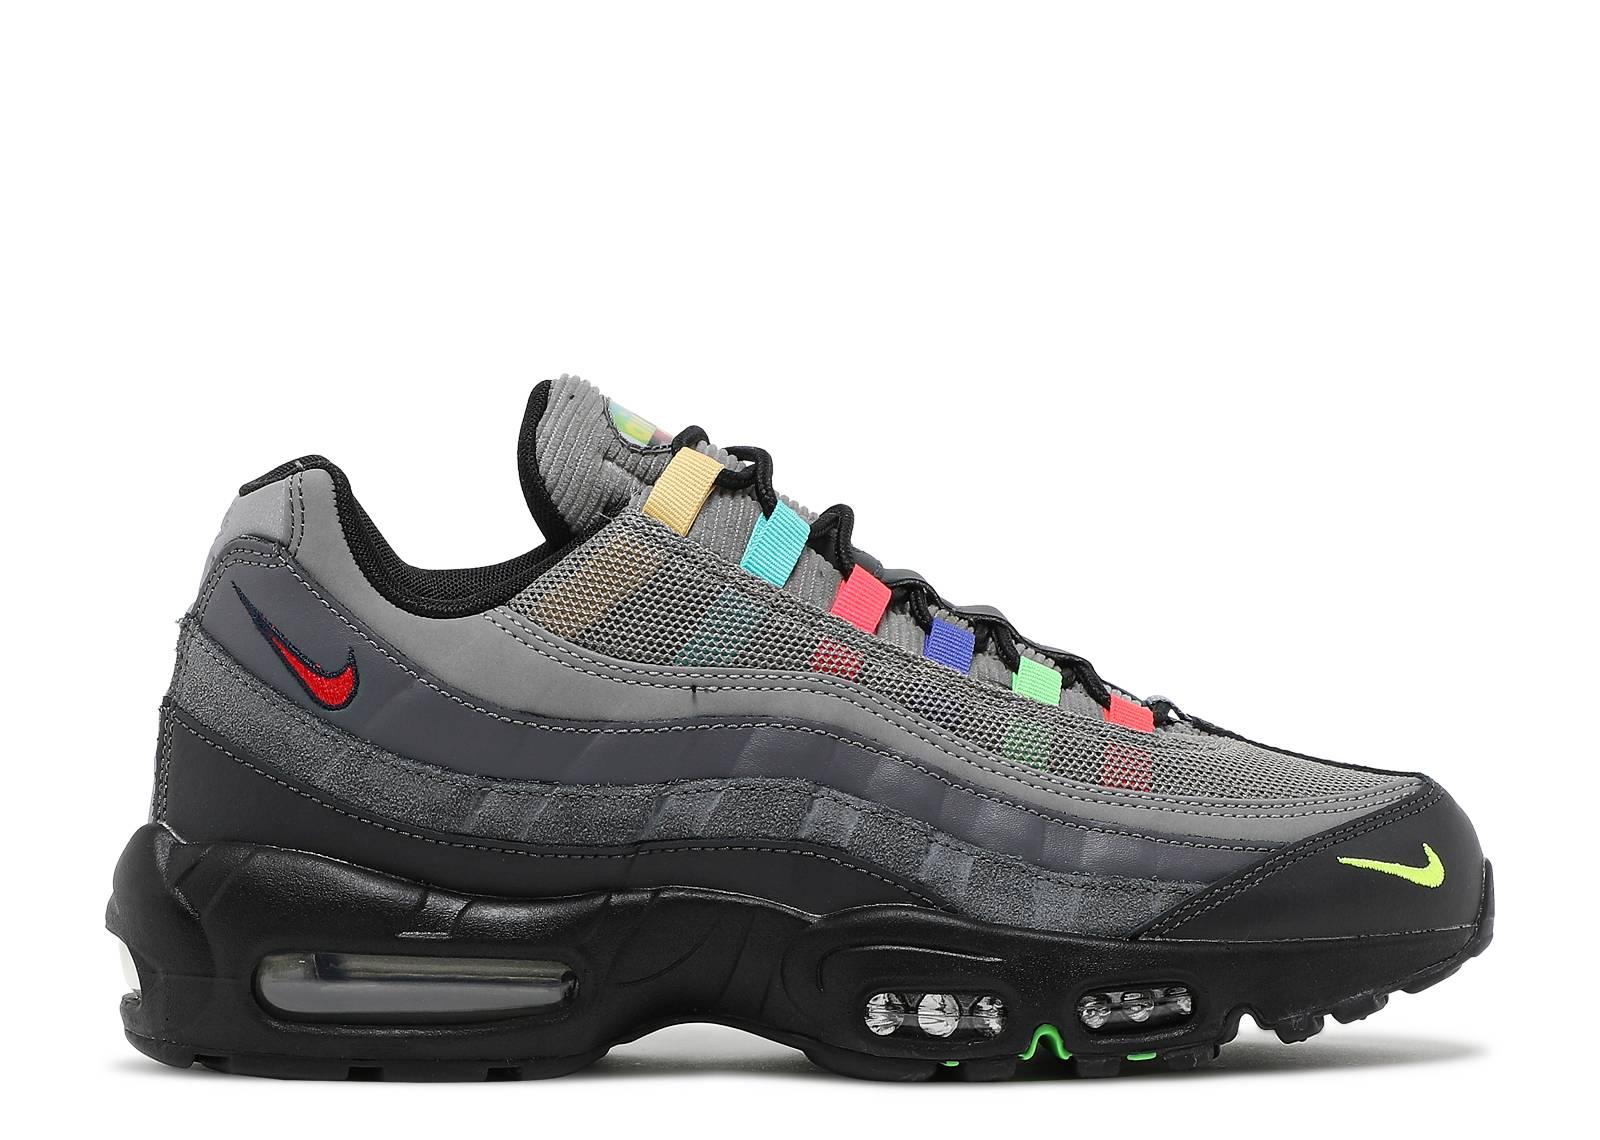 Nike Air Max 95 Sneakers | Flight Club